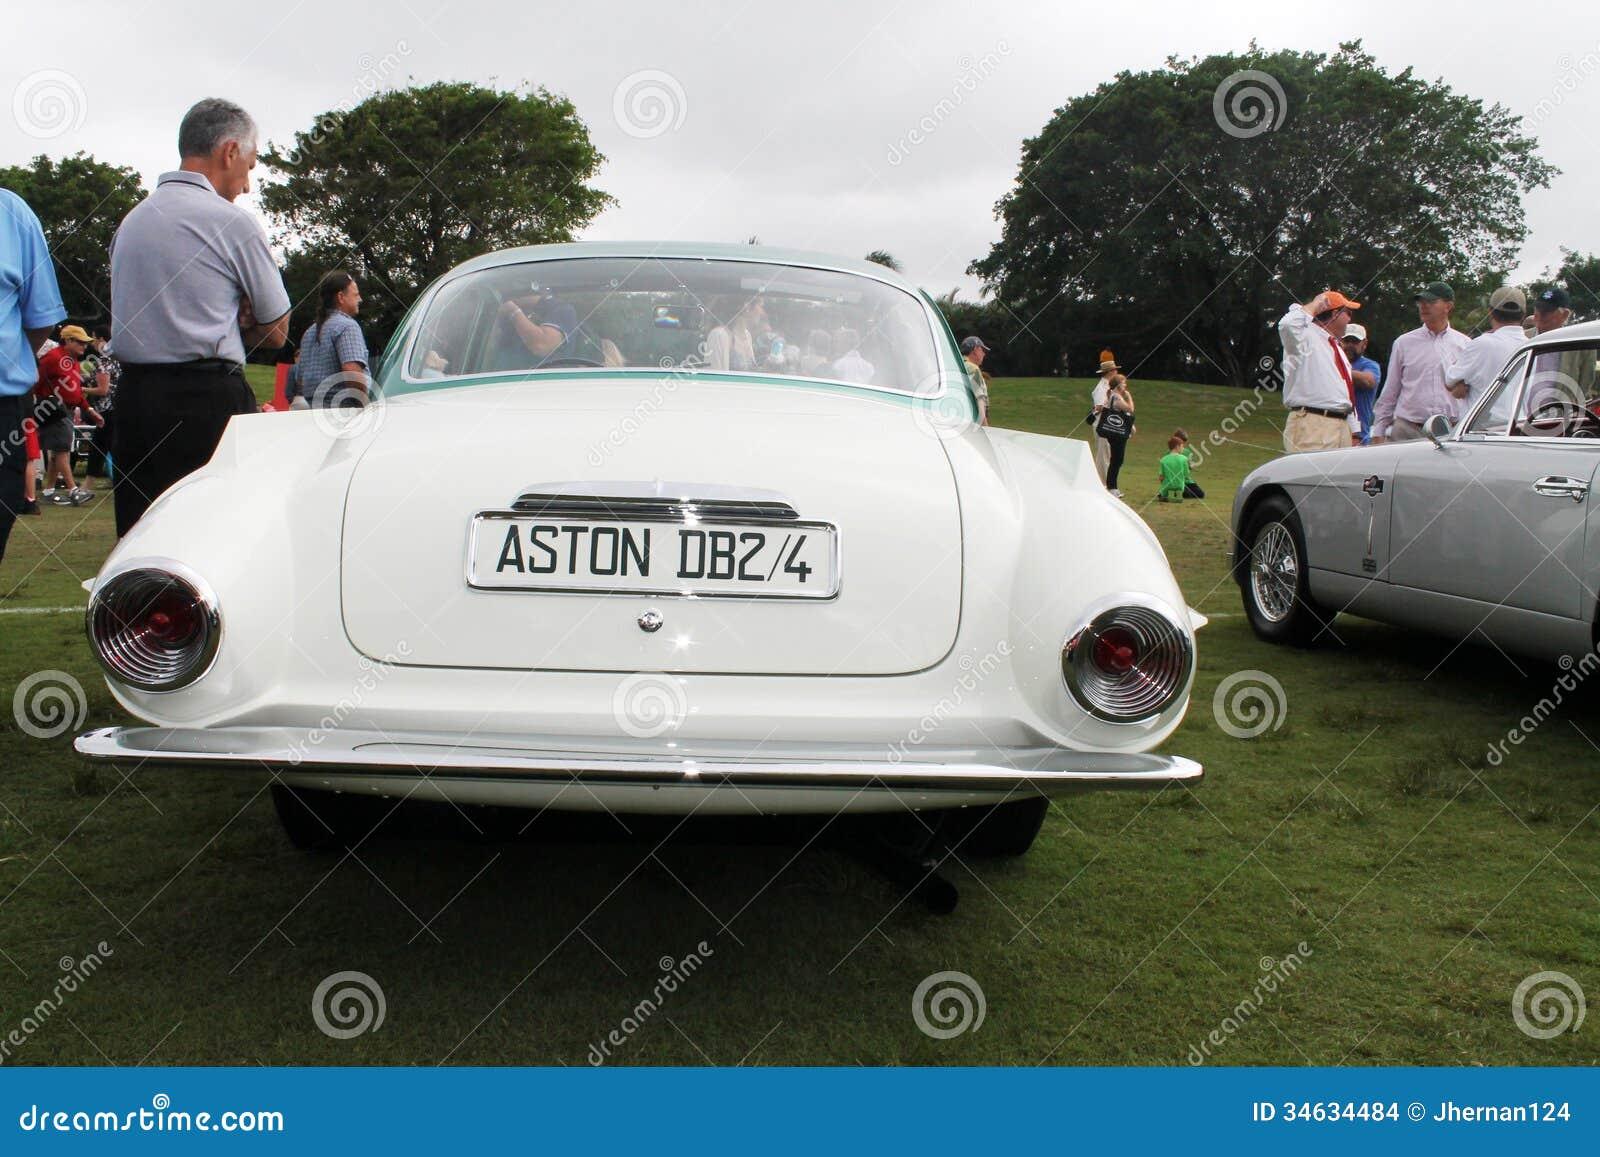 Classic British Sports Car Trunk Editorial Image ...  Classic British...